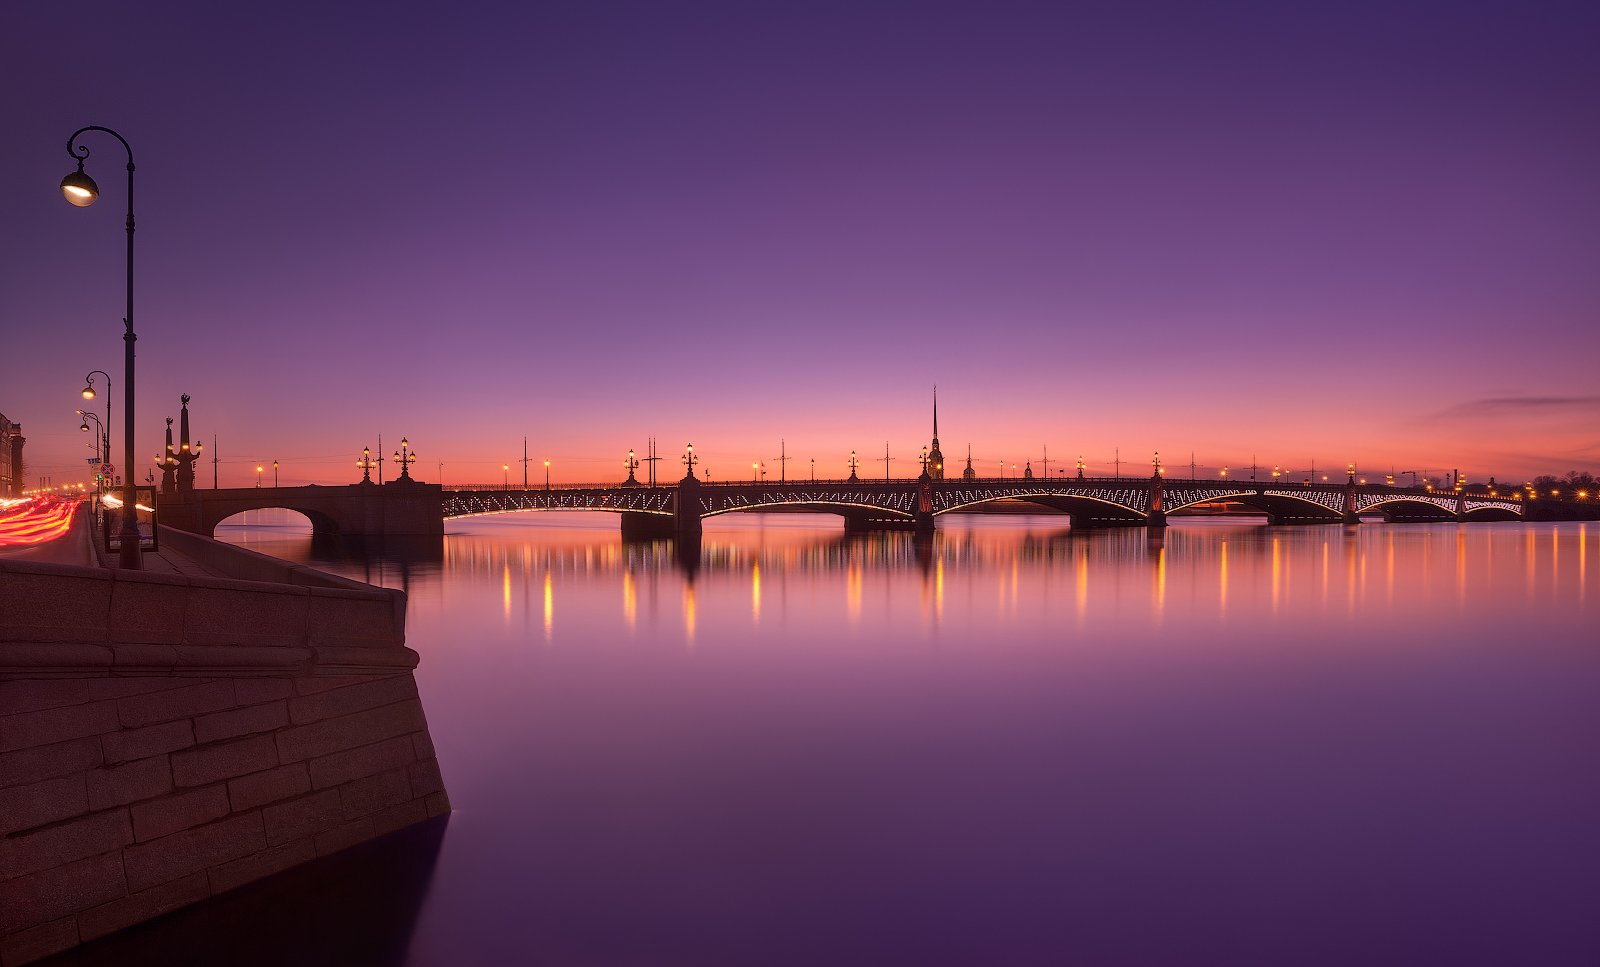 санкт-петербург, вечер, весна, троицкий, мост, закат, Sergey Louks